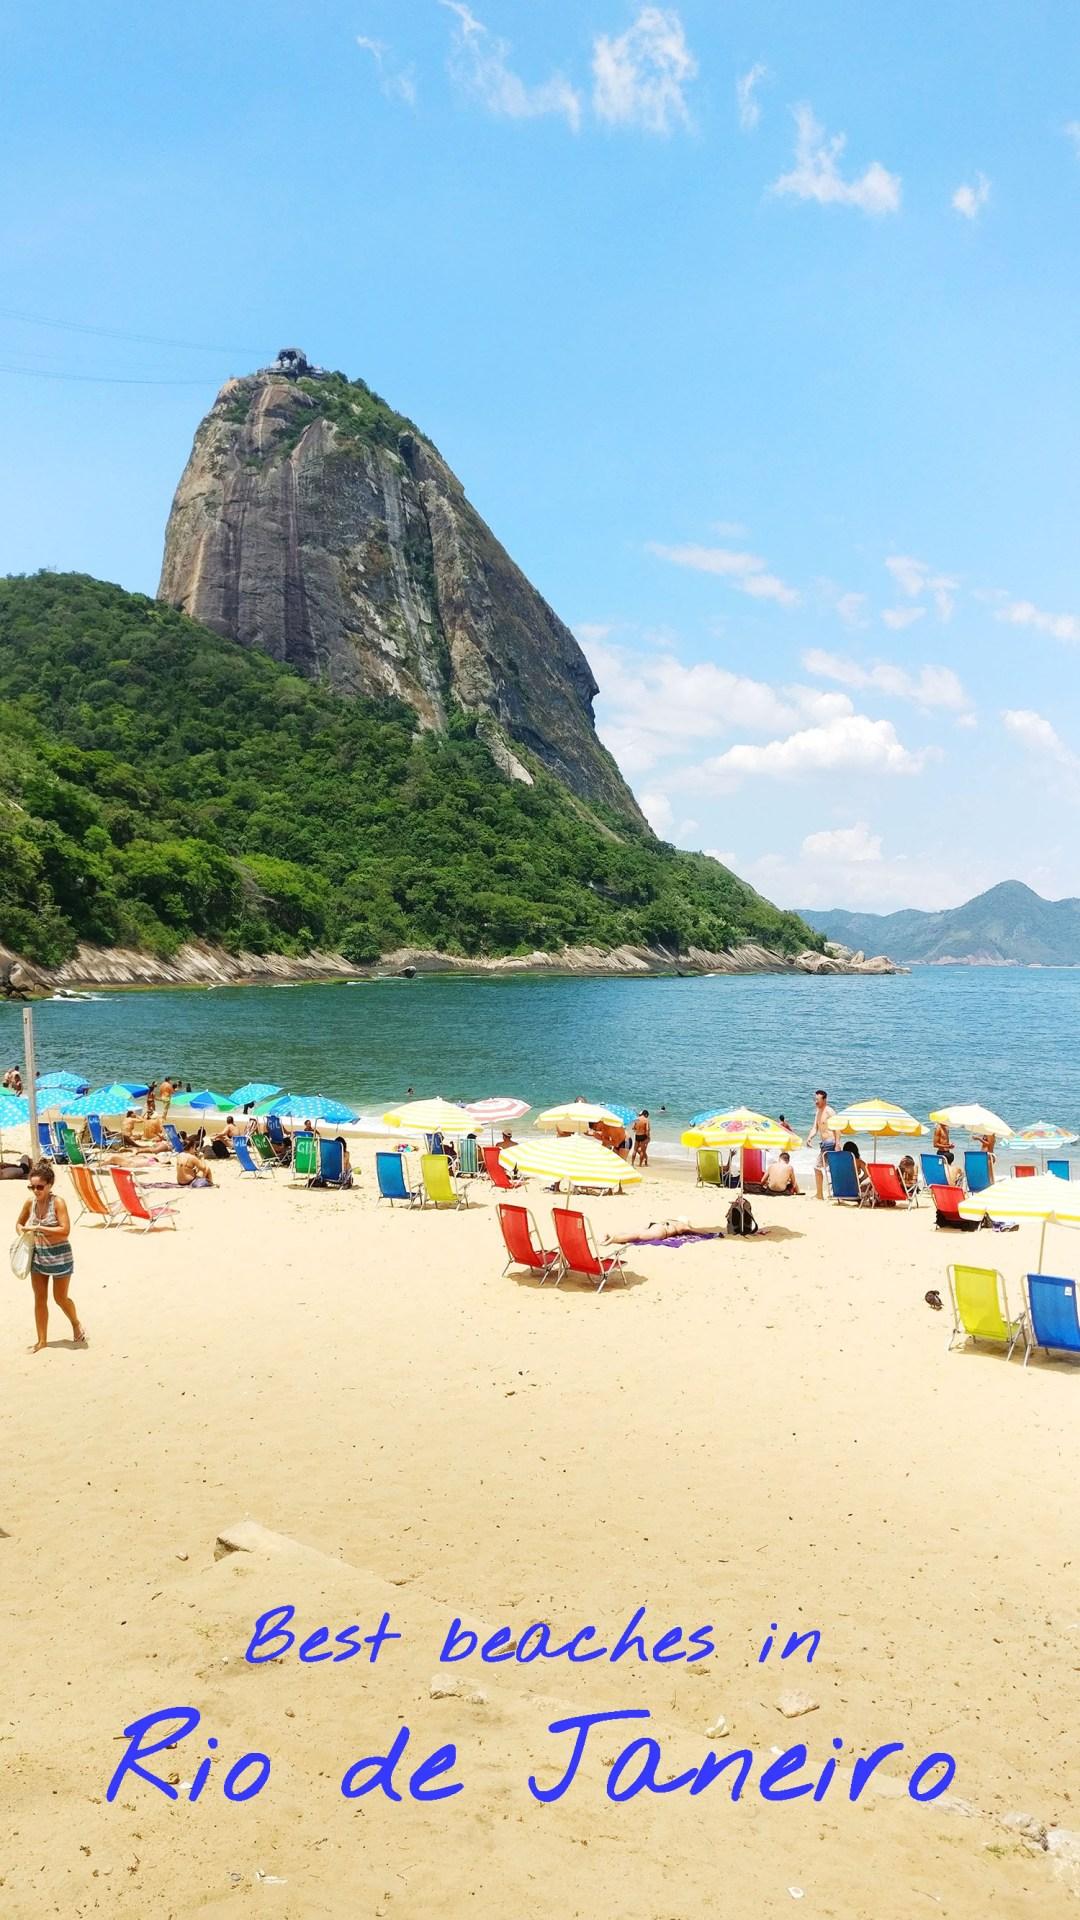 Best beaches in Rio de Janeiro | Aliz's Wonderland